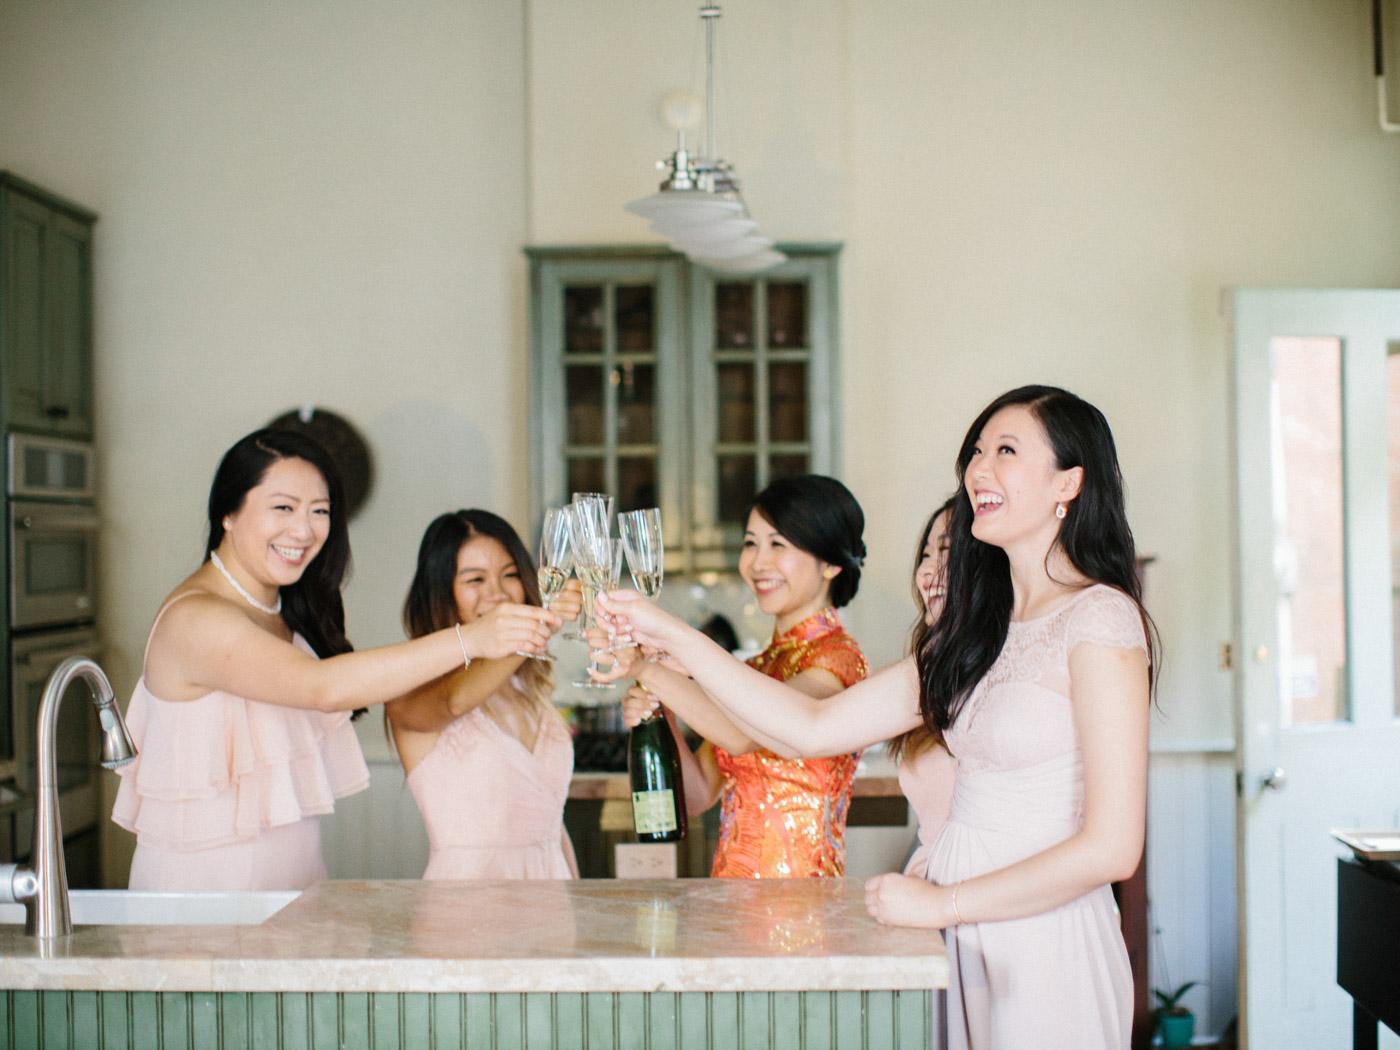 toronto_wedding_photographer_fine_art_documentary_photography-57.jpg